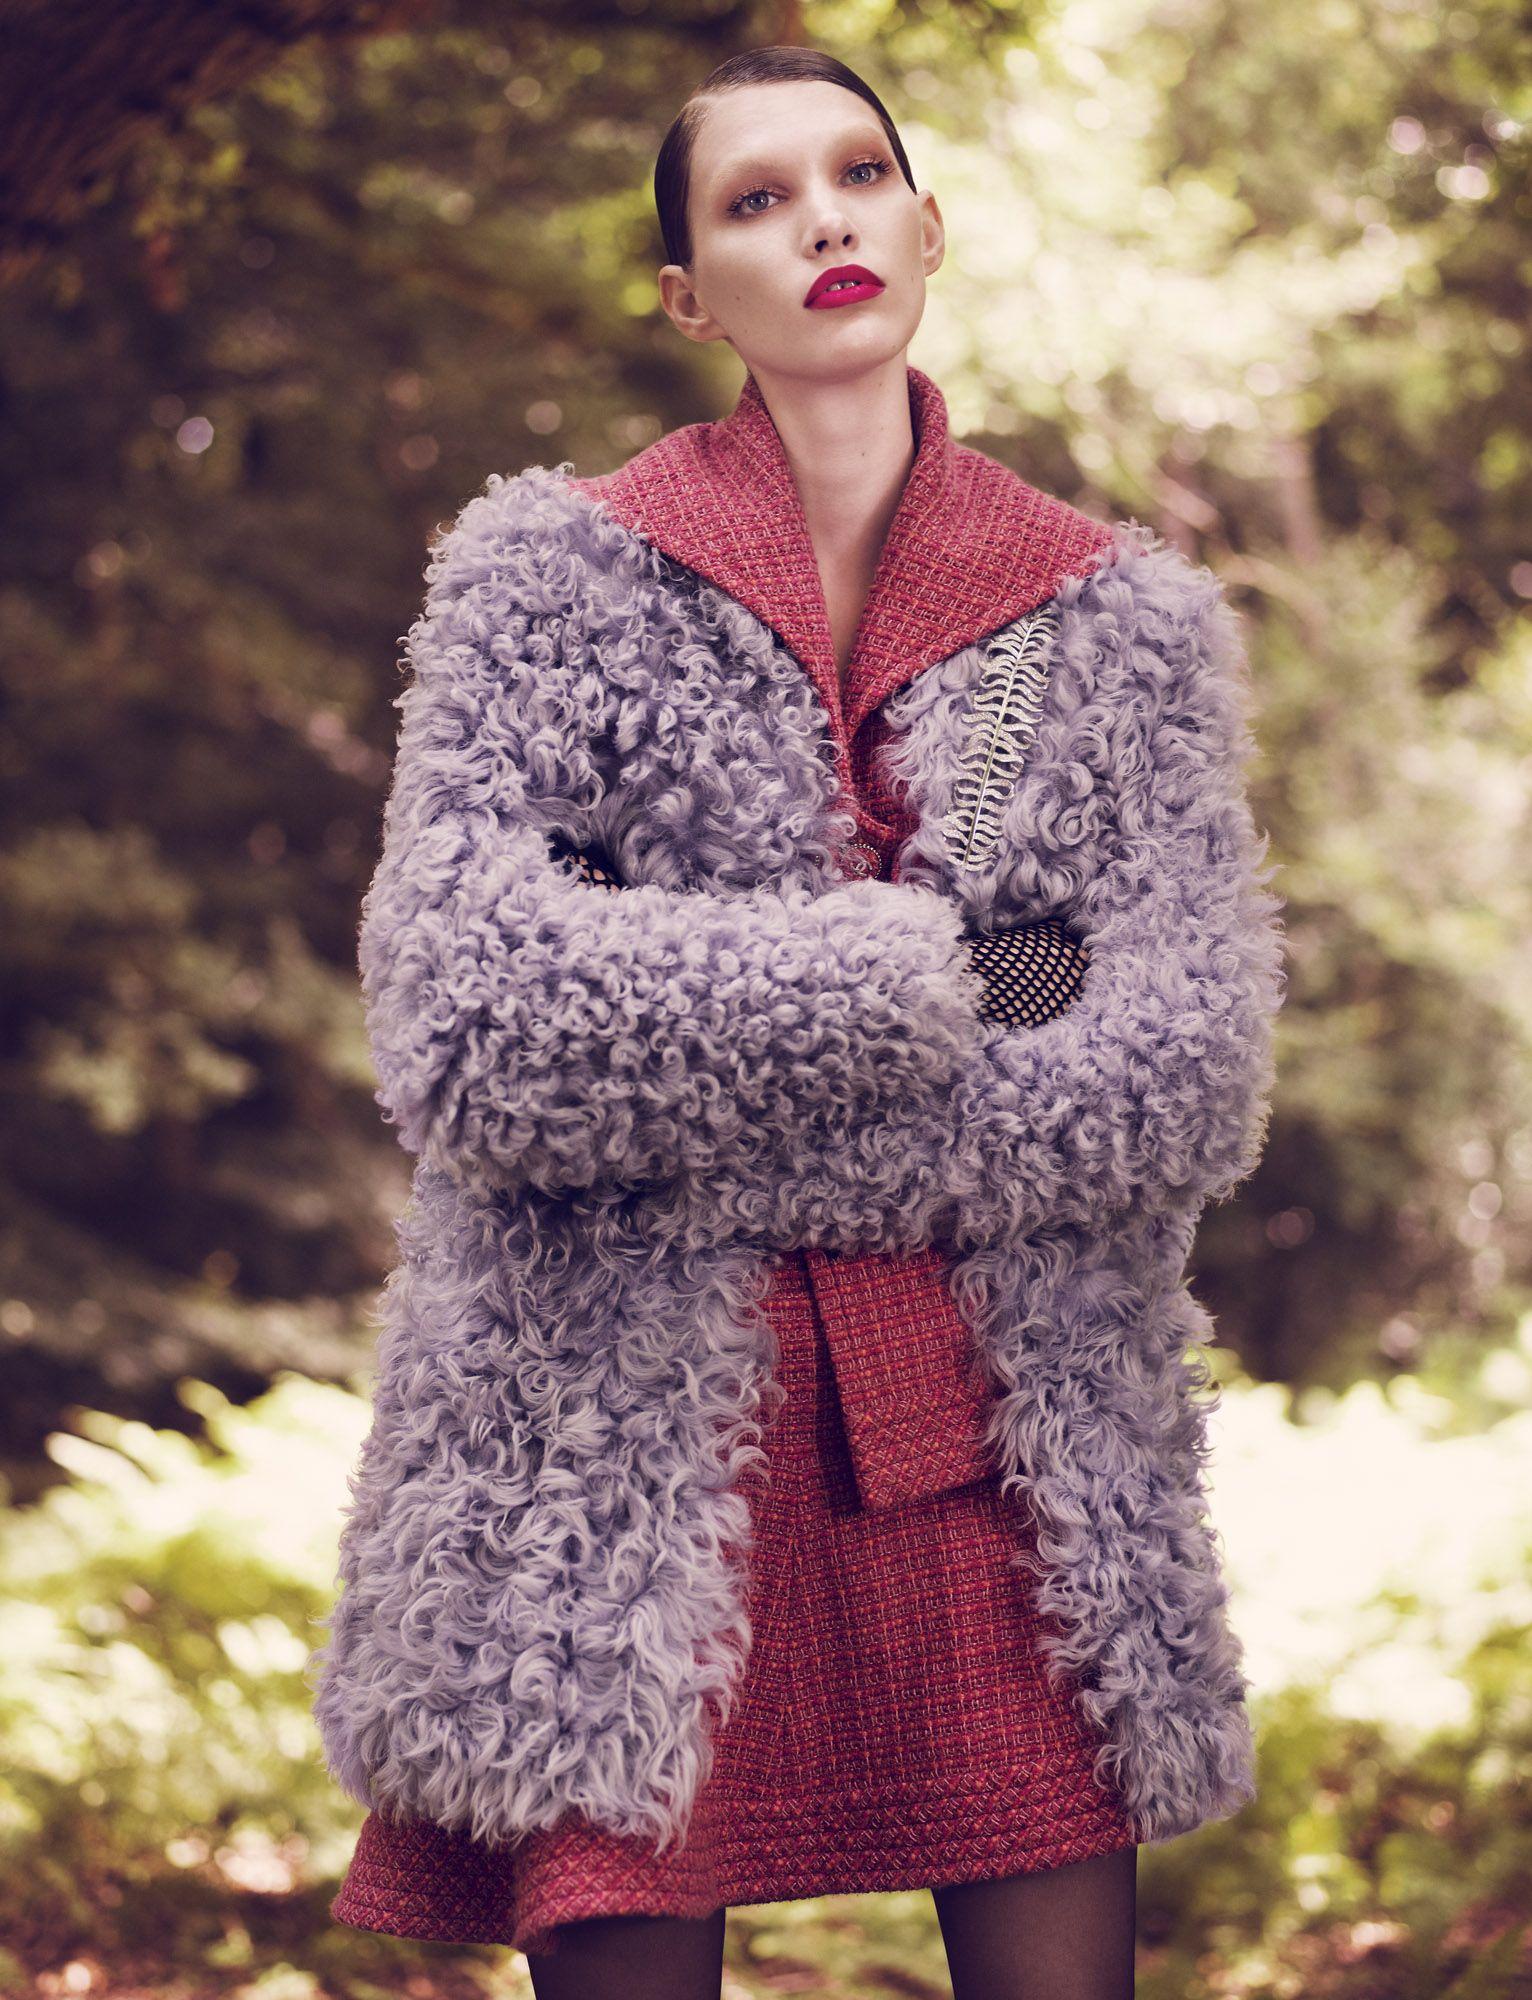 Publication: Exit Magazine Issue: Spring/Summer 2014 Title: Fur Real Model: Irina Nikolaeva Photography: Jens Langkjaer Styling: Sam Ranger Hair: Bianca Tuovi Make-up: Mel Arter